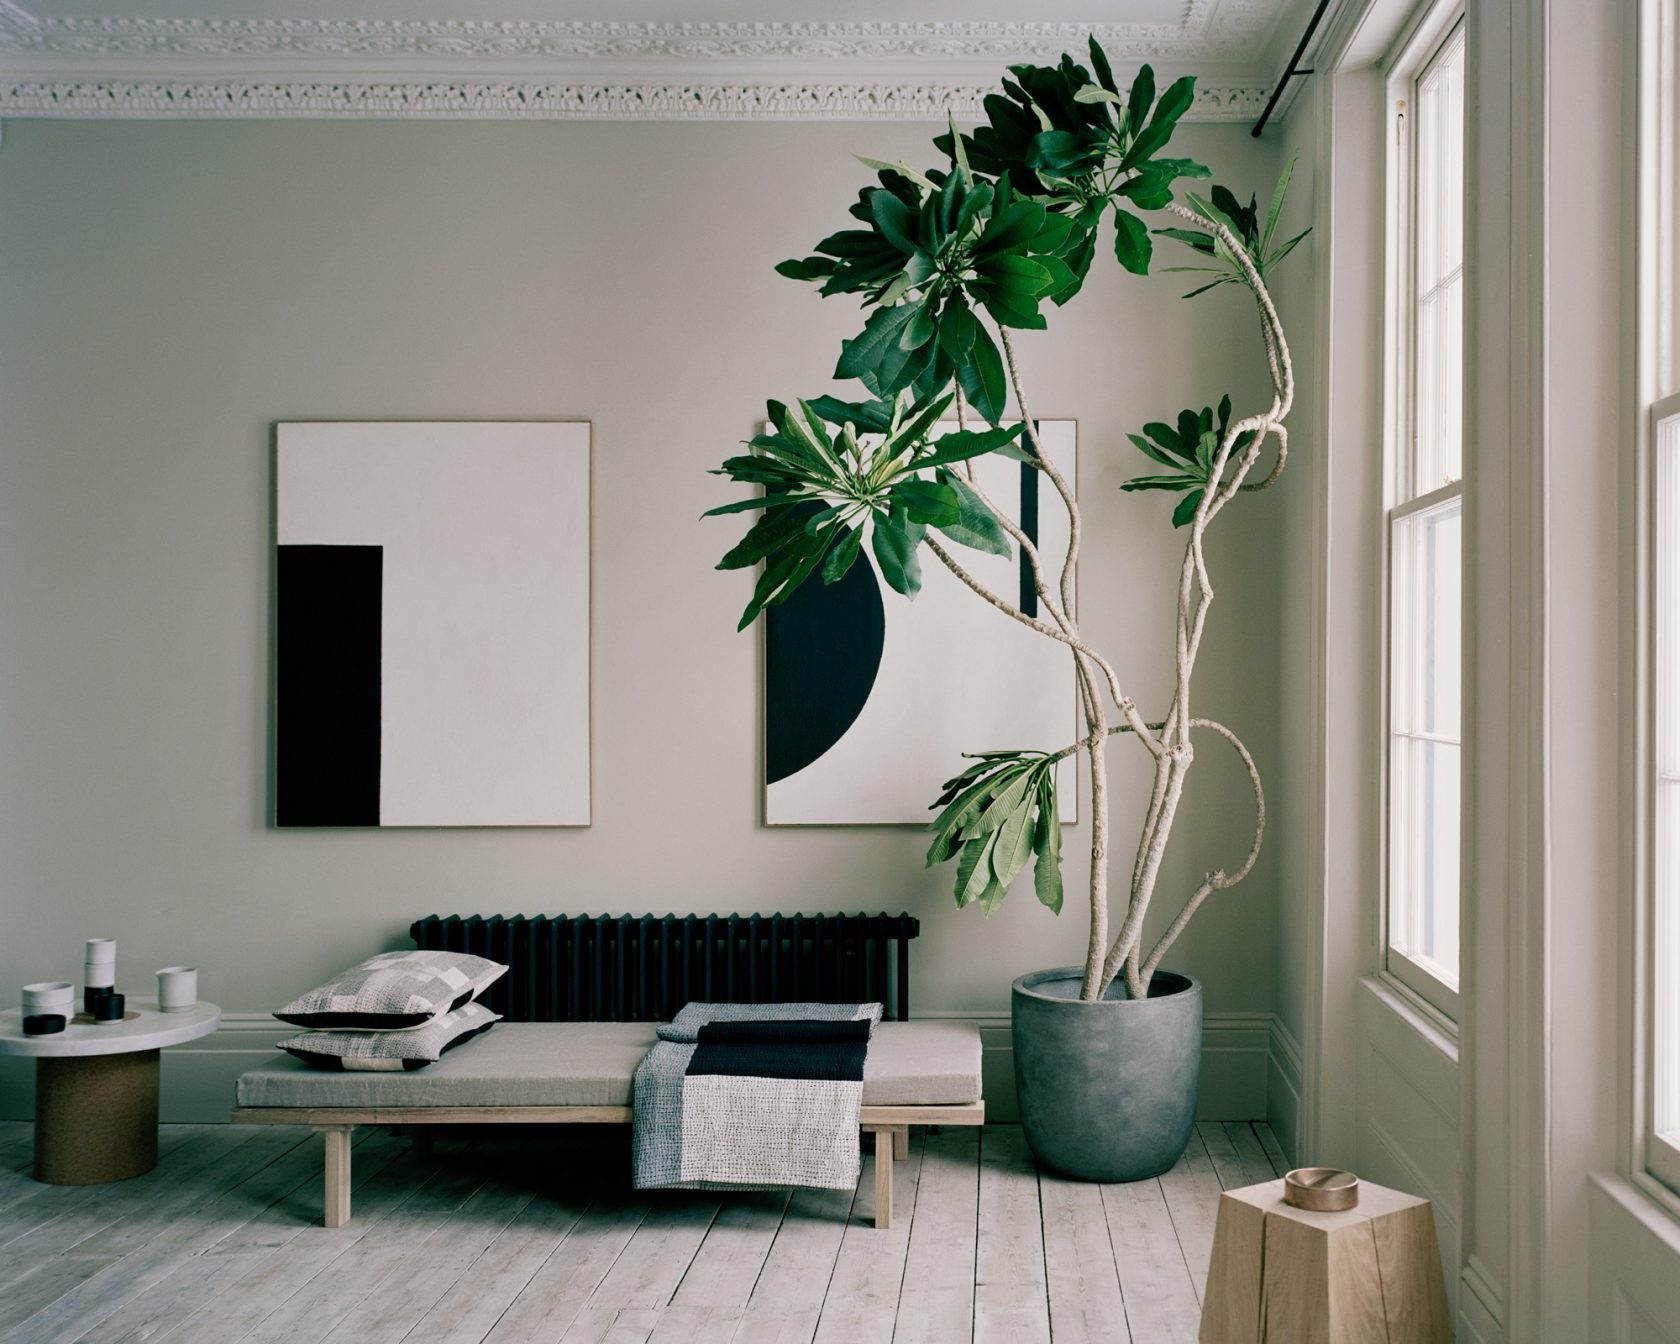 House_of_Grey_Exhibition_daybed_artwork_neutrals.jpg